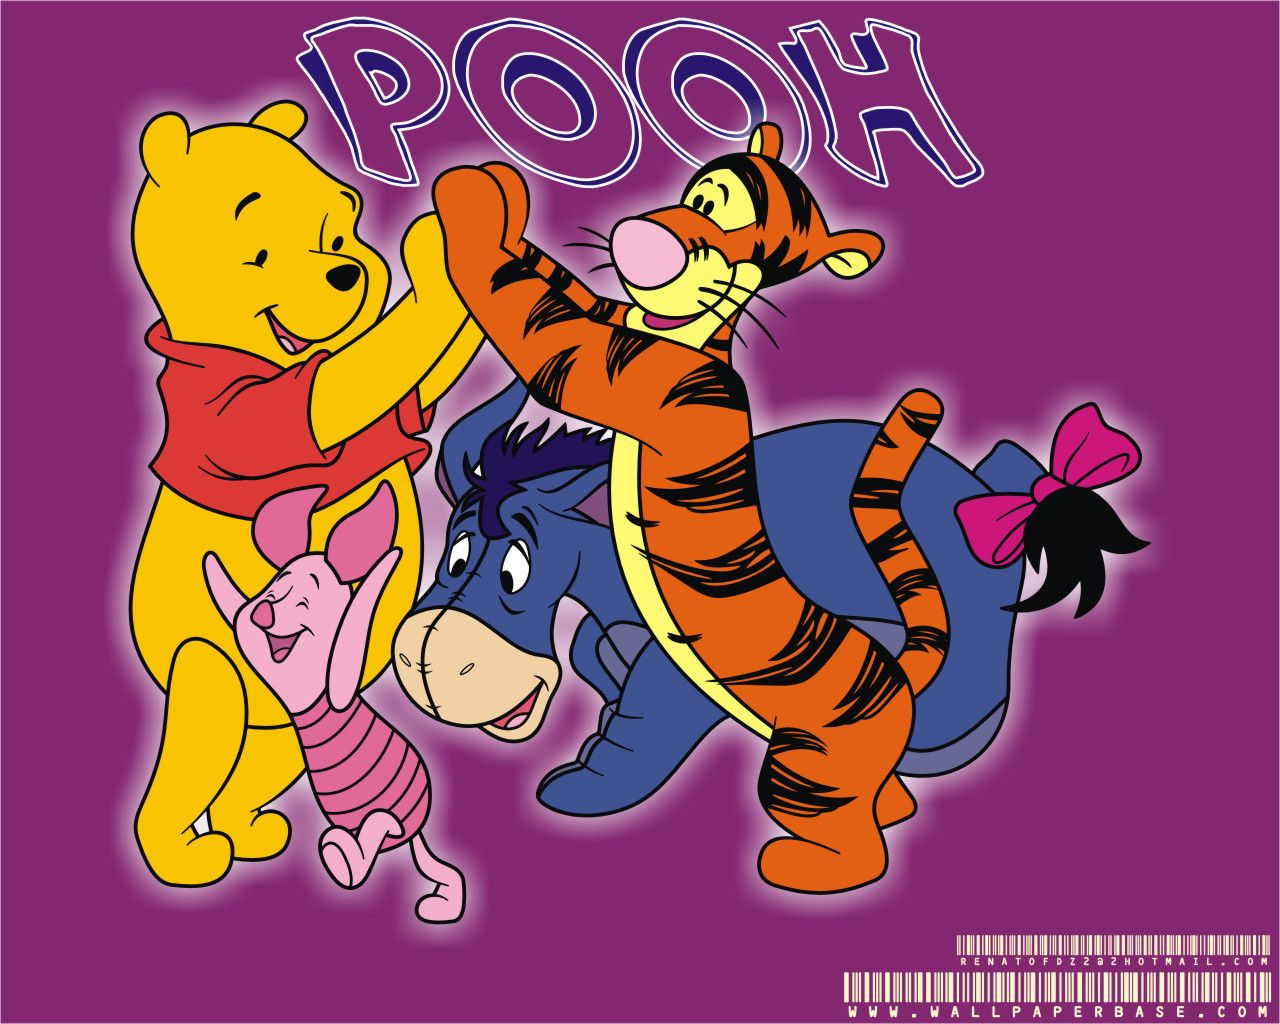 Bamboo design ipad air 2 wallpapers ipad air 2 wallpapers - Winnie The Pooh Disney Hd Wallpaper For Ipad Air 2 Cartoons